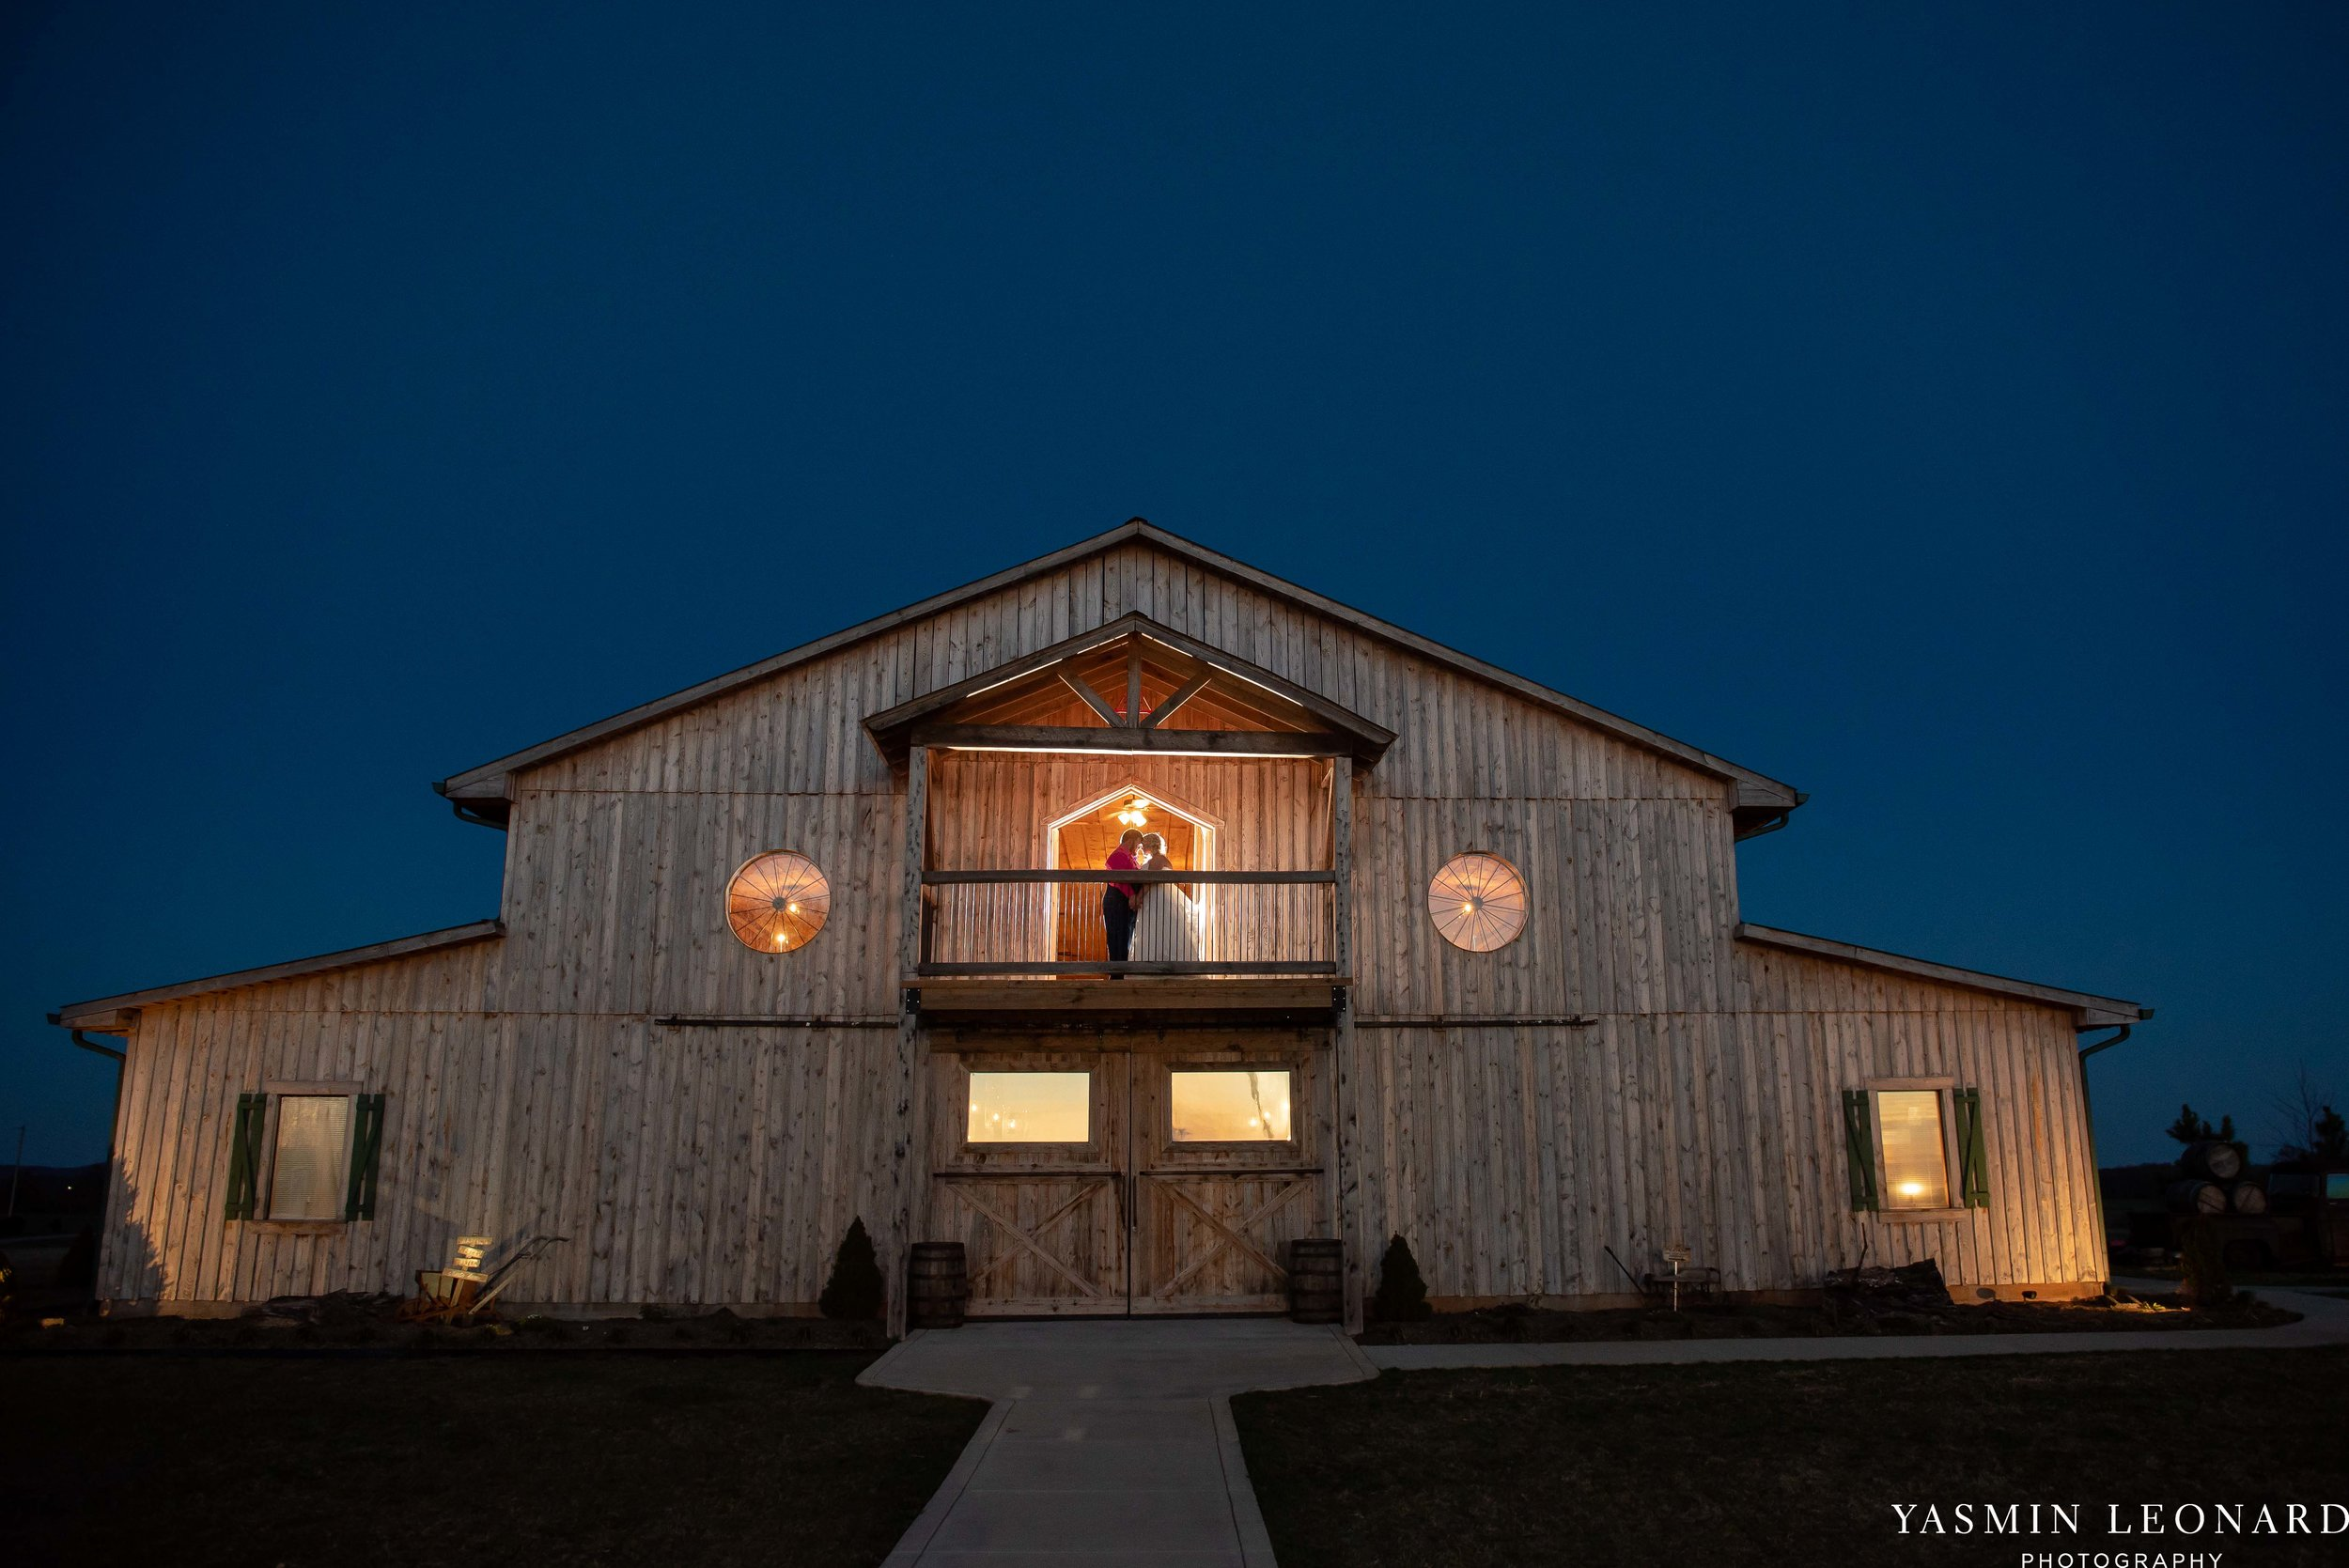 The Barn at Heritage Farm - Country Wedding - Pink and Blue Wedding - Barn Wedding - Outdoor Wedding - Cotton and Wheat Decor - Groom in Bibs - Pink Bridal Colors - Yasmin Leonard Photography-33.jpg